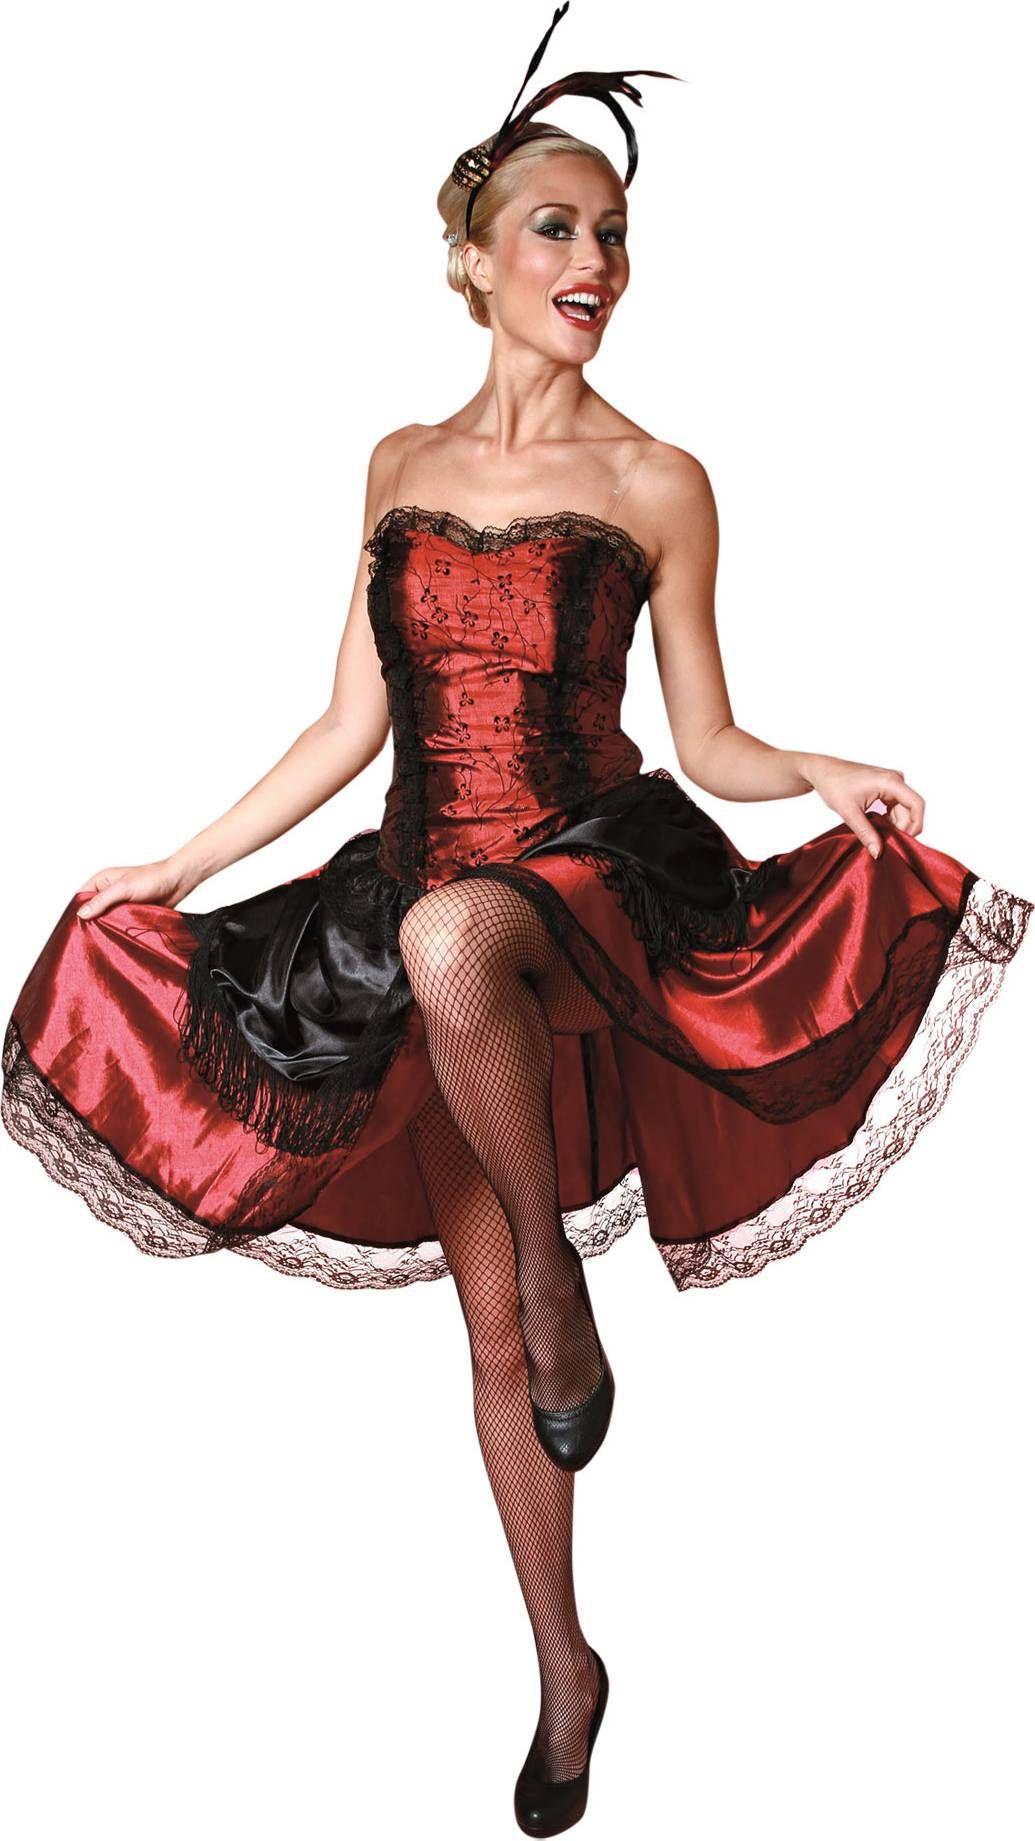 d guisement danseuse de french cancan femme halloween. Black Bedroom Furniture Sets. Home Design Ideas